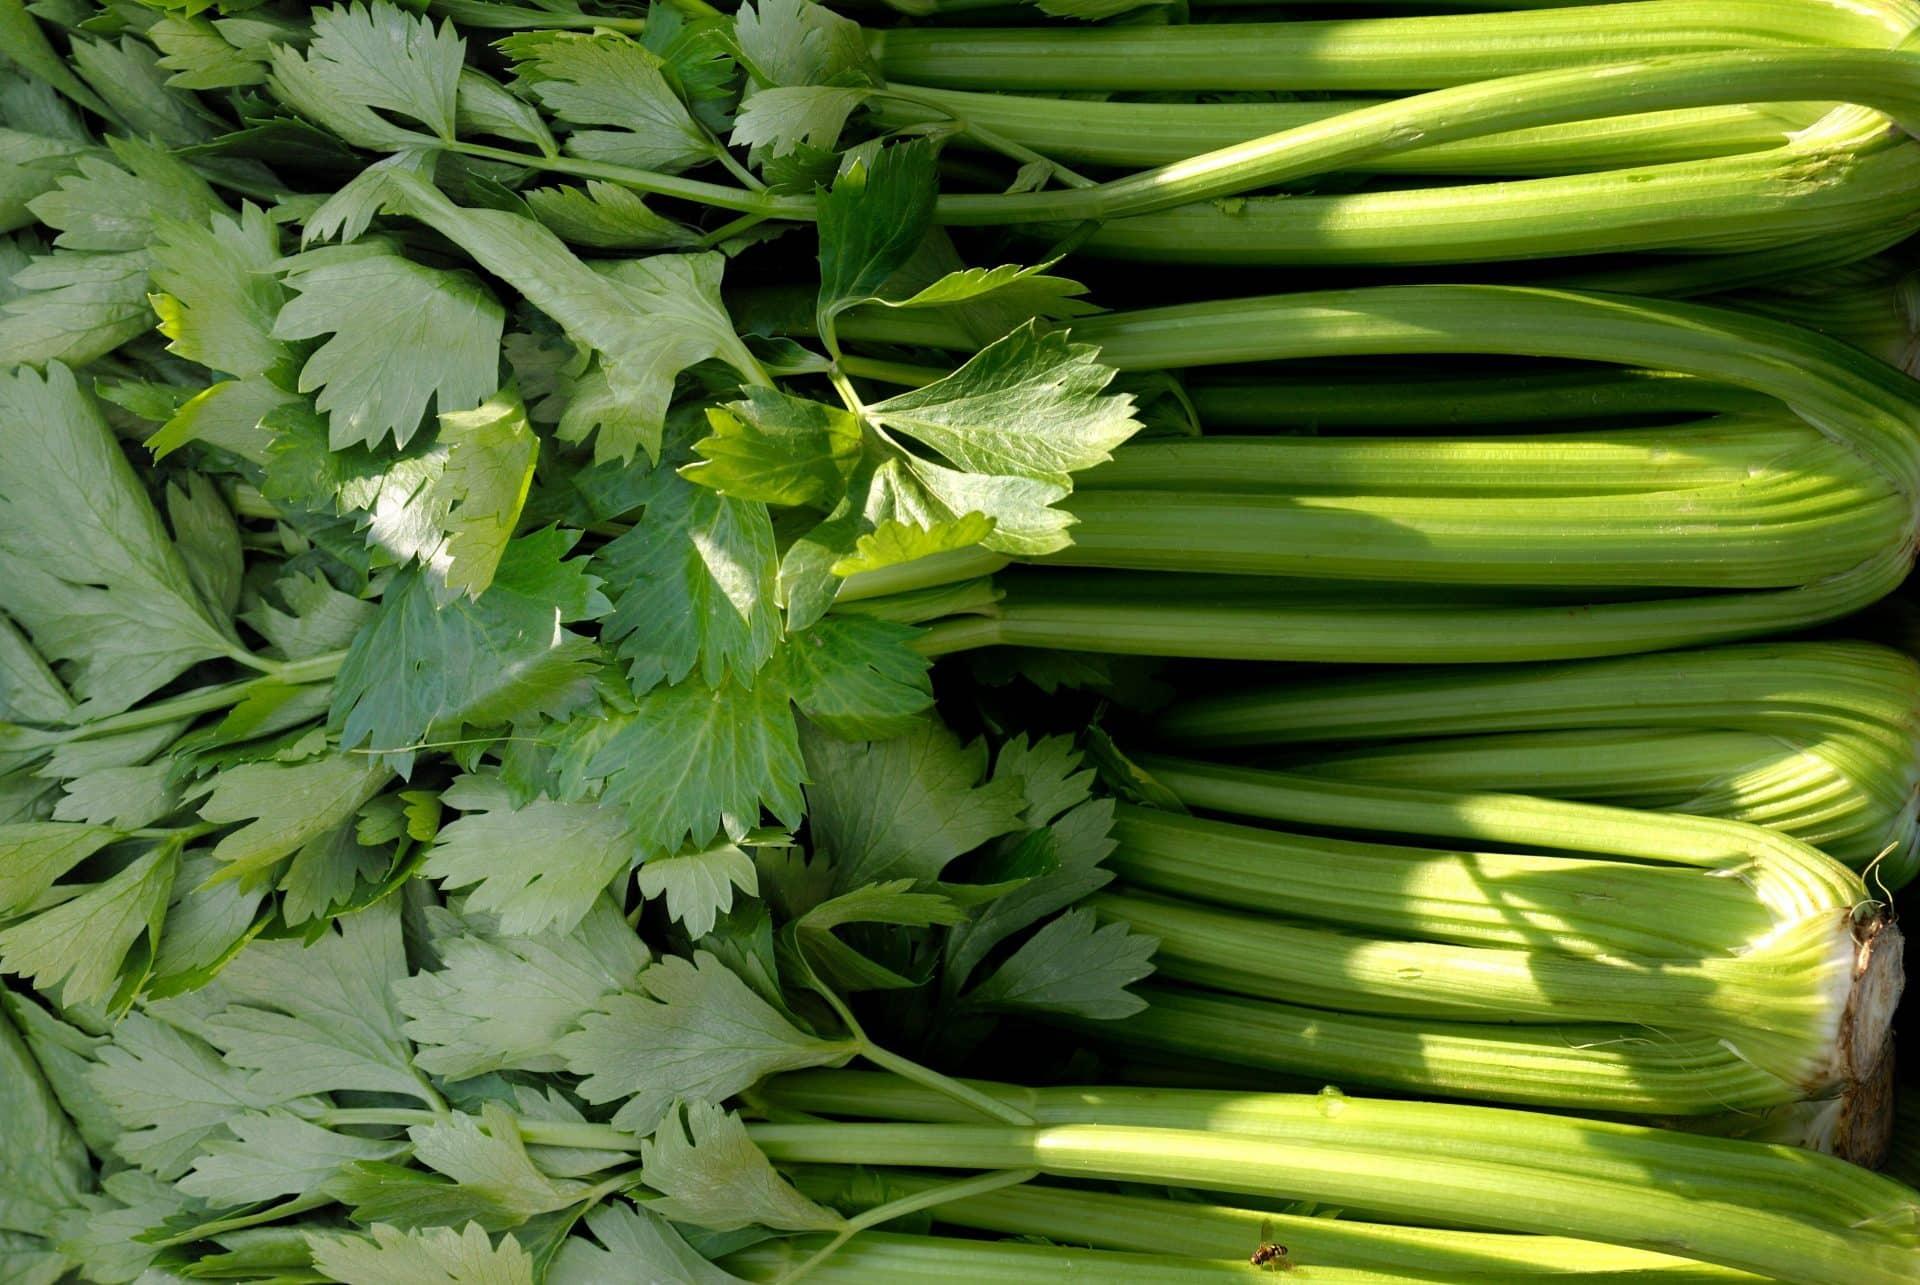 Celery Di vernio